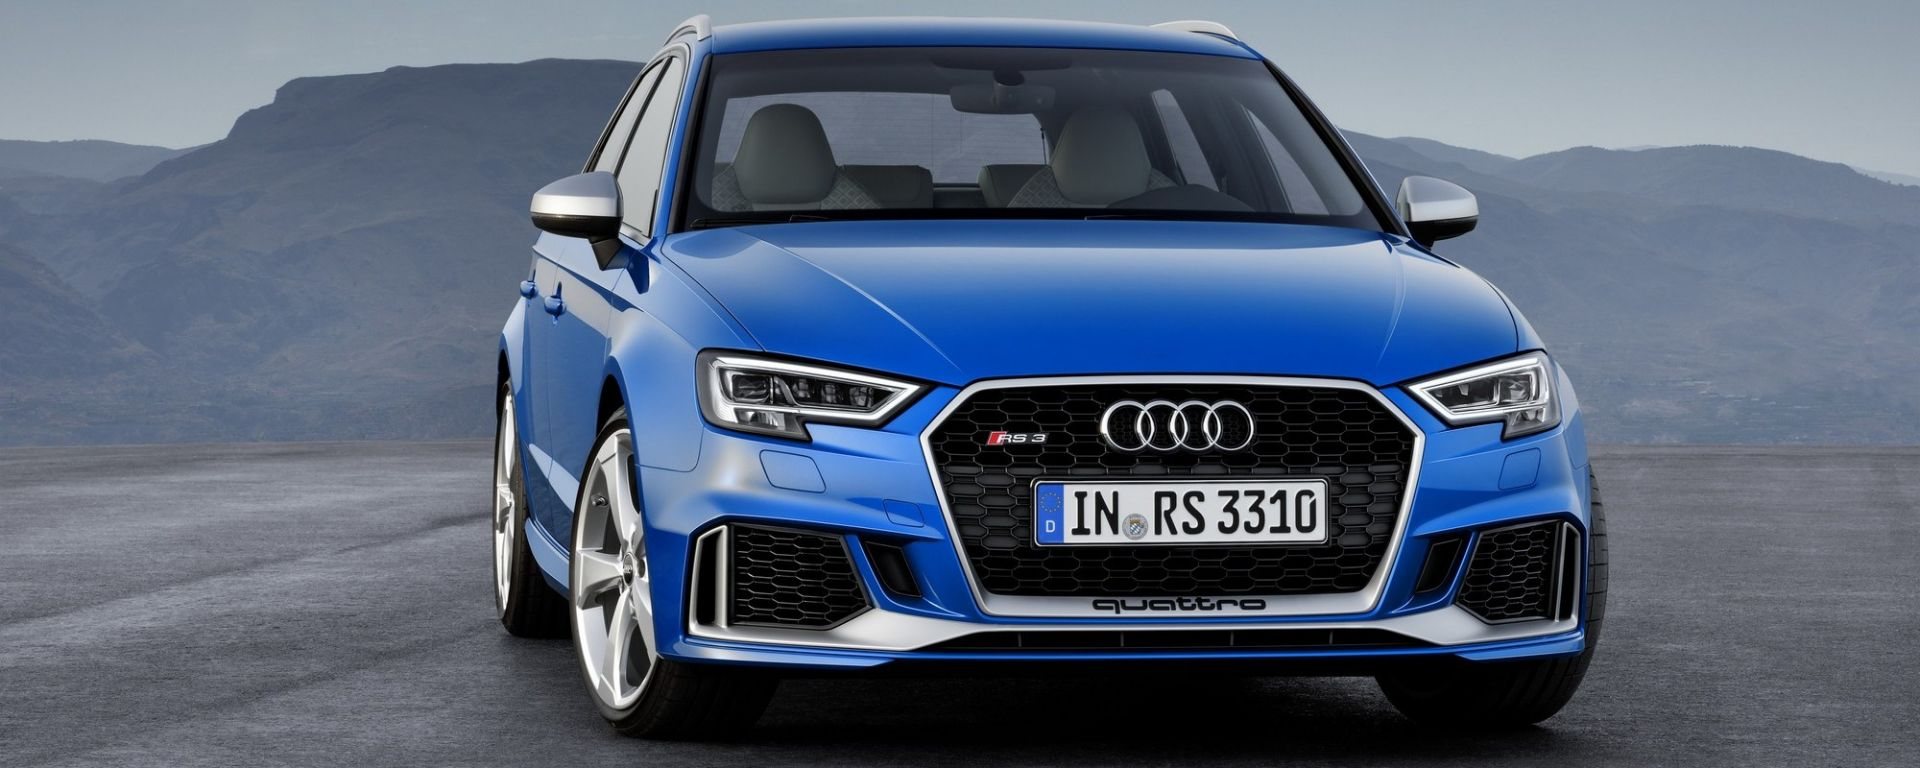 Salone di ginevra 2017 audi rs3 sportback 2017 a ginevra for Audi a3 restyling 2017